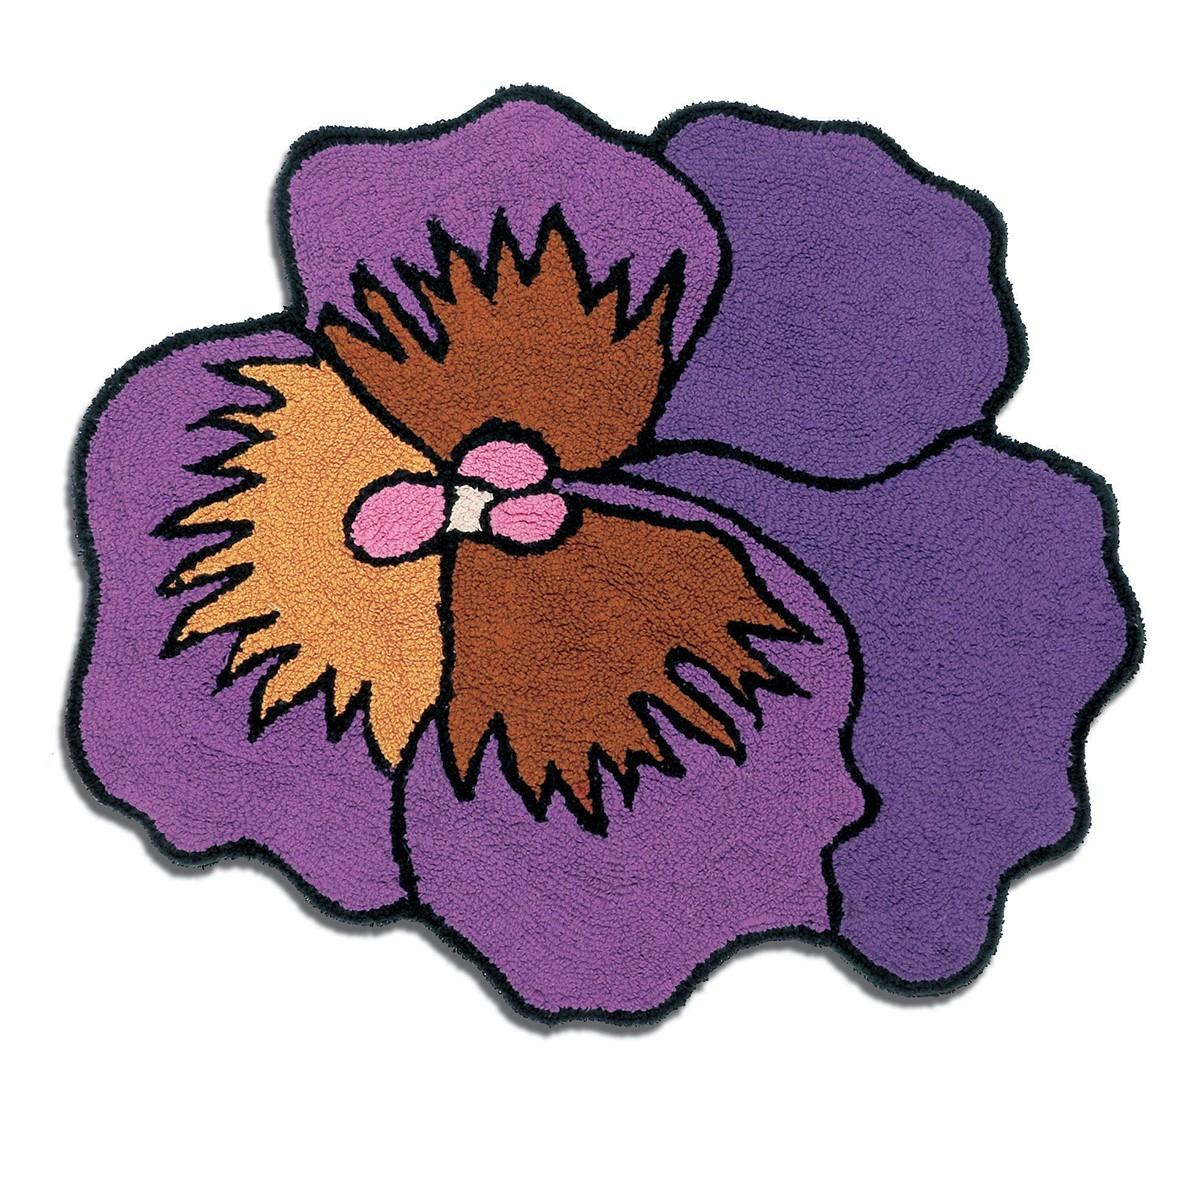 Tappeto bagno Missoni Parma Viola diametro 90 cm var. 3